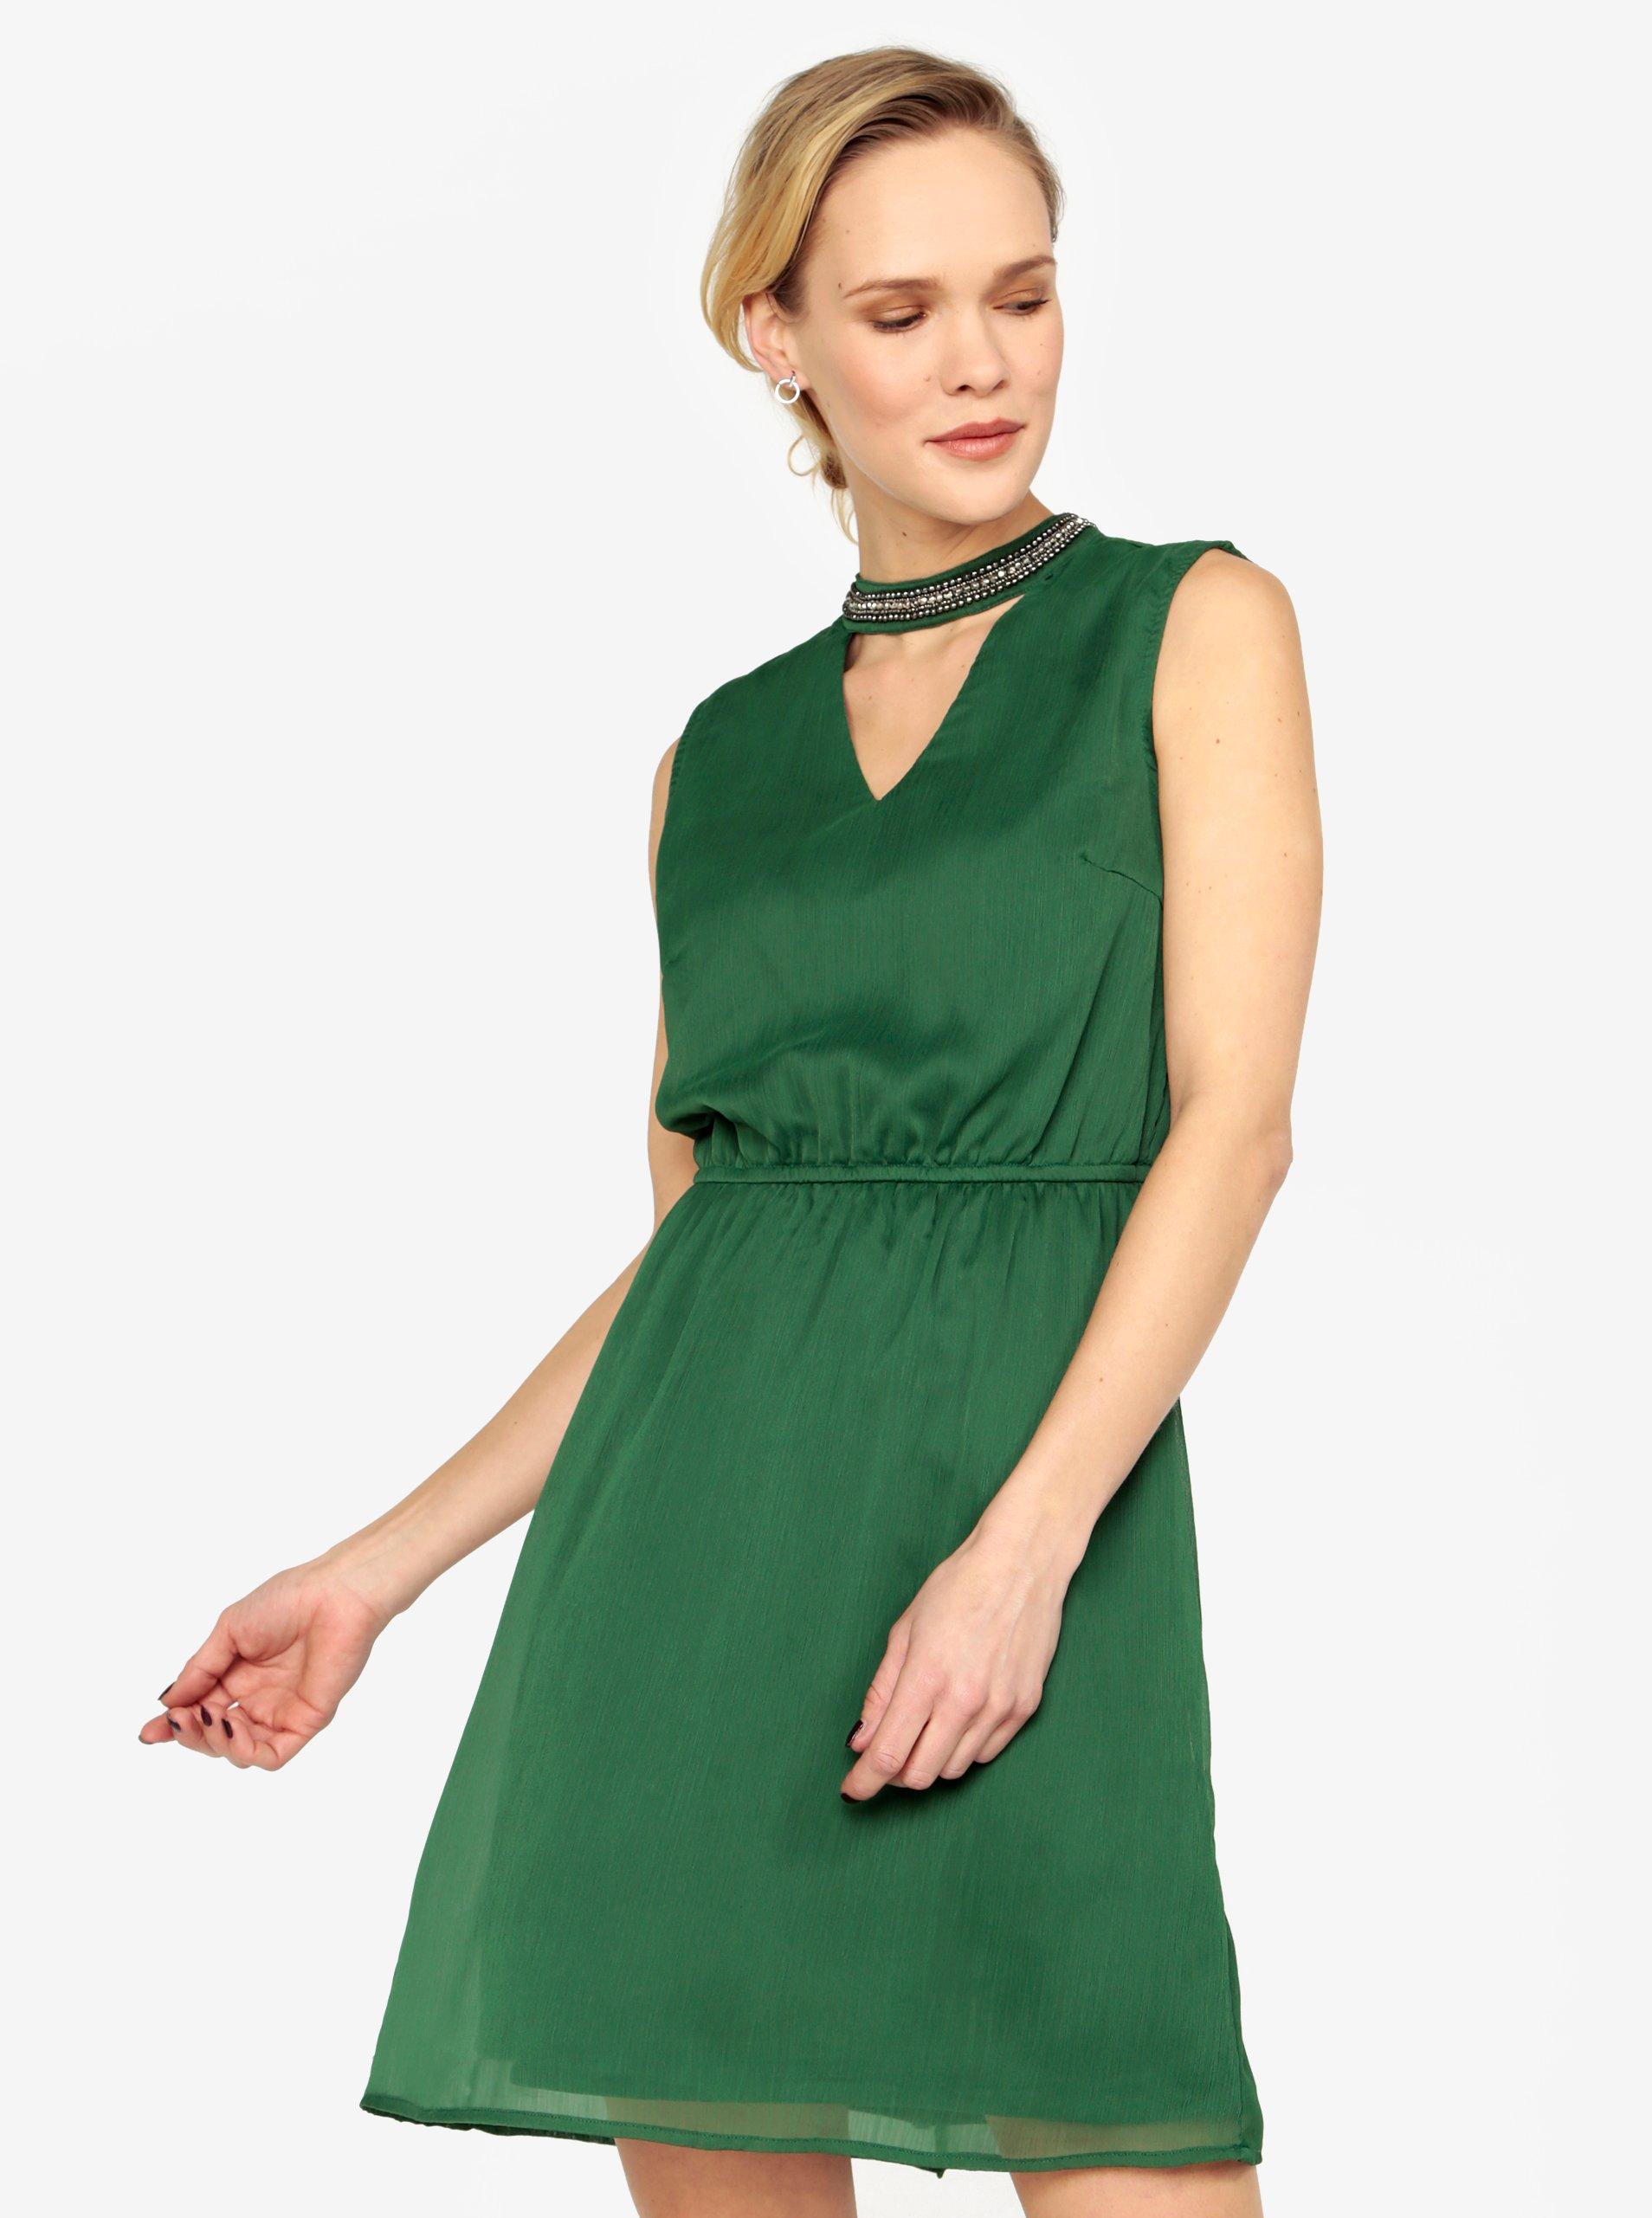 Zelené šaty s koráilkovou aplikáciou ONLY Dafne  7a491a9022